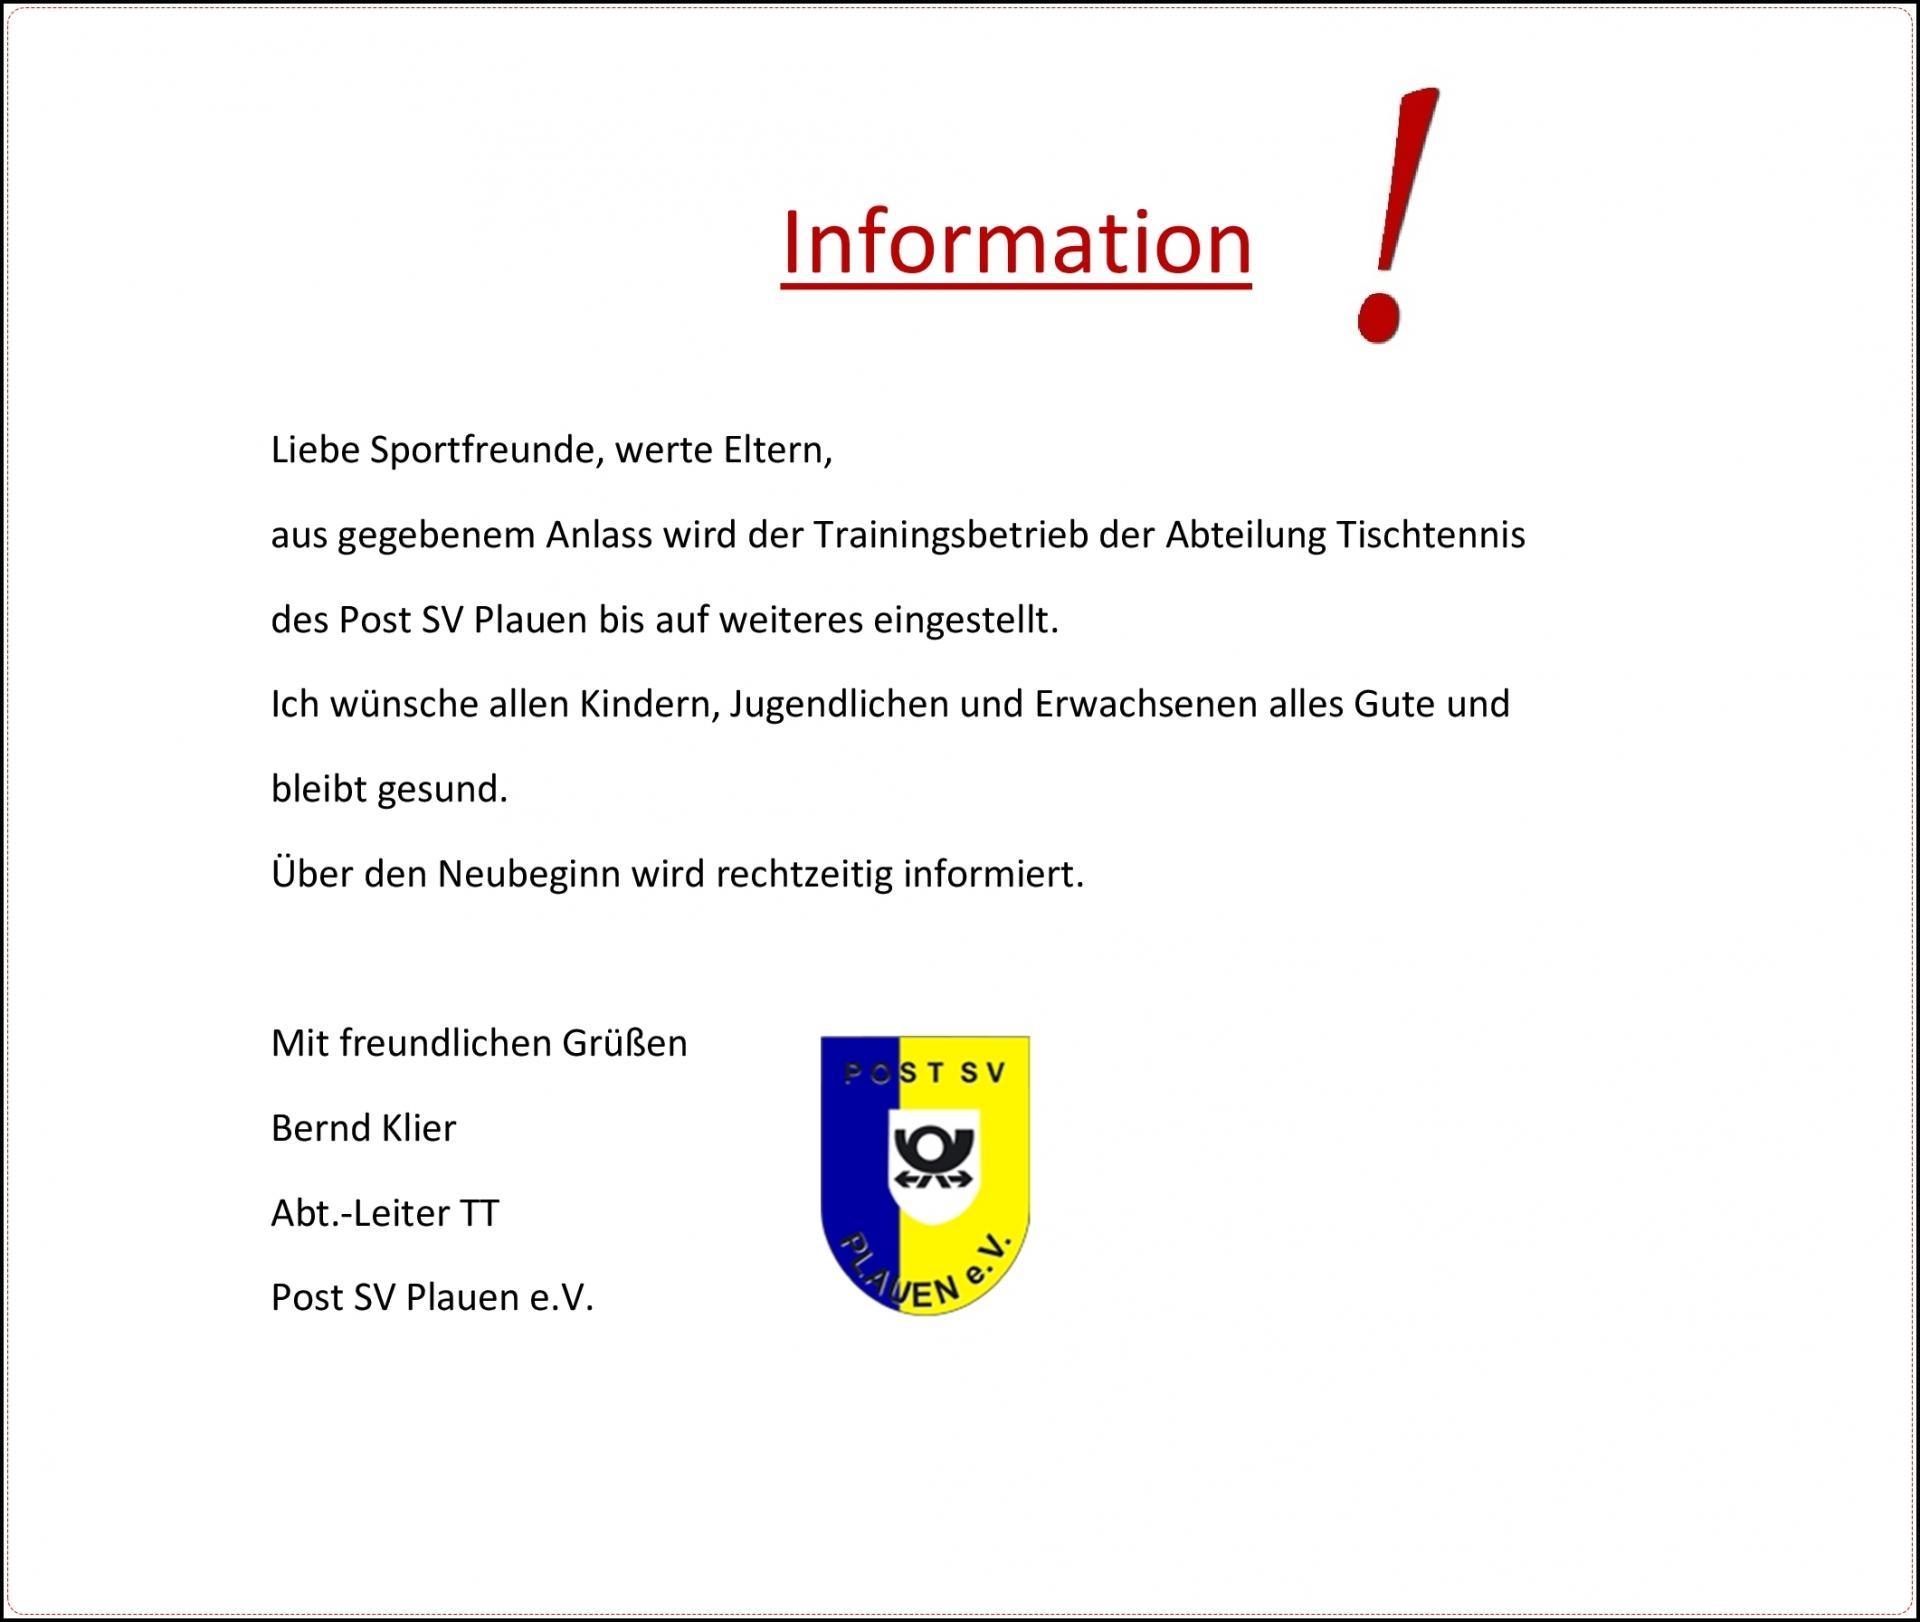 Information!